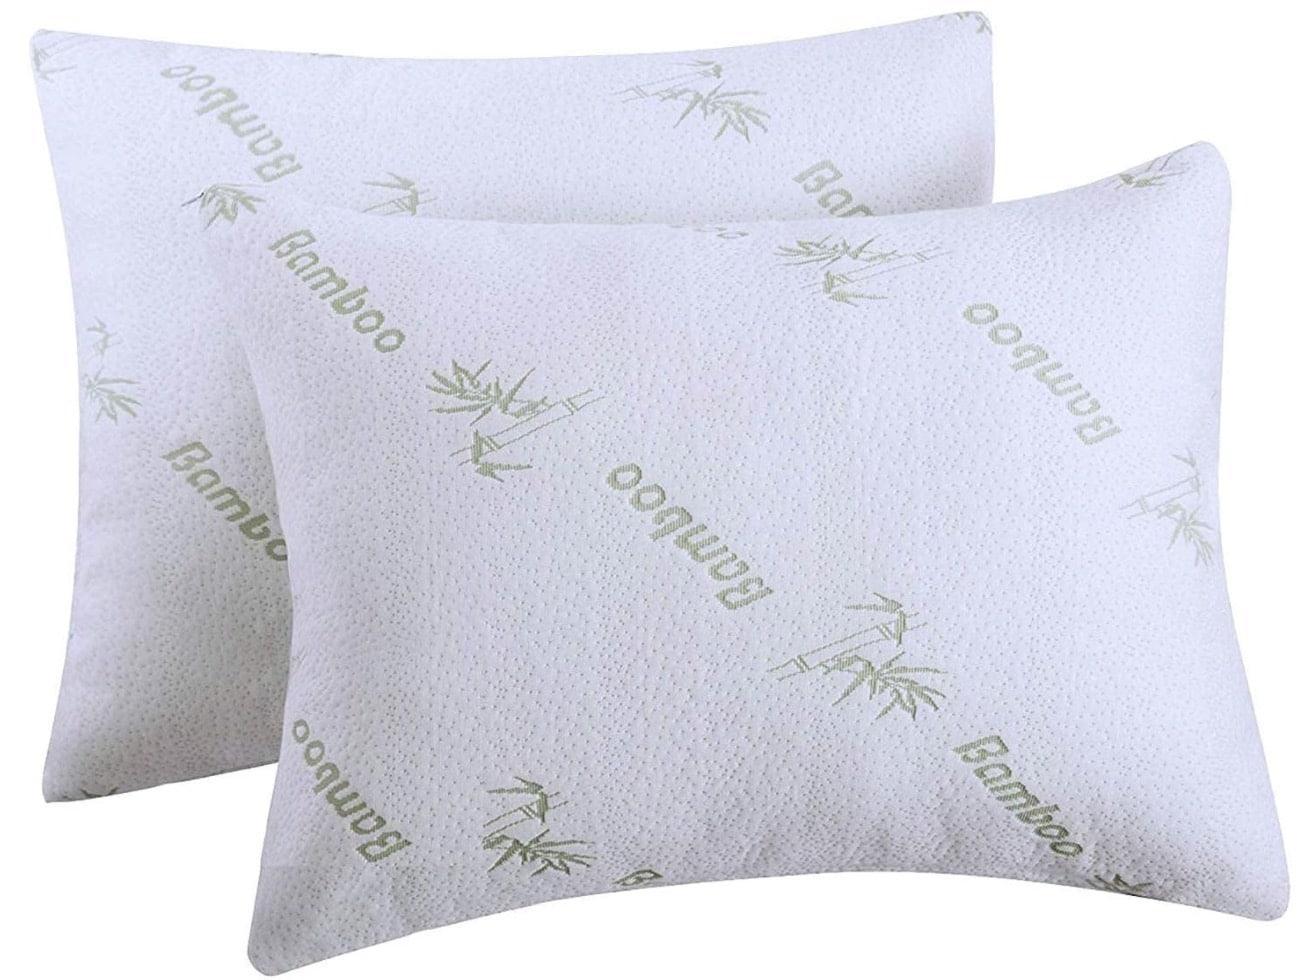 Niagara Sleep Solution - Super Soft Bamboo Cooling Pillow Protectors